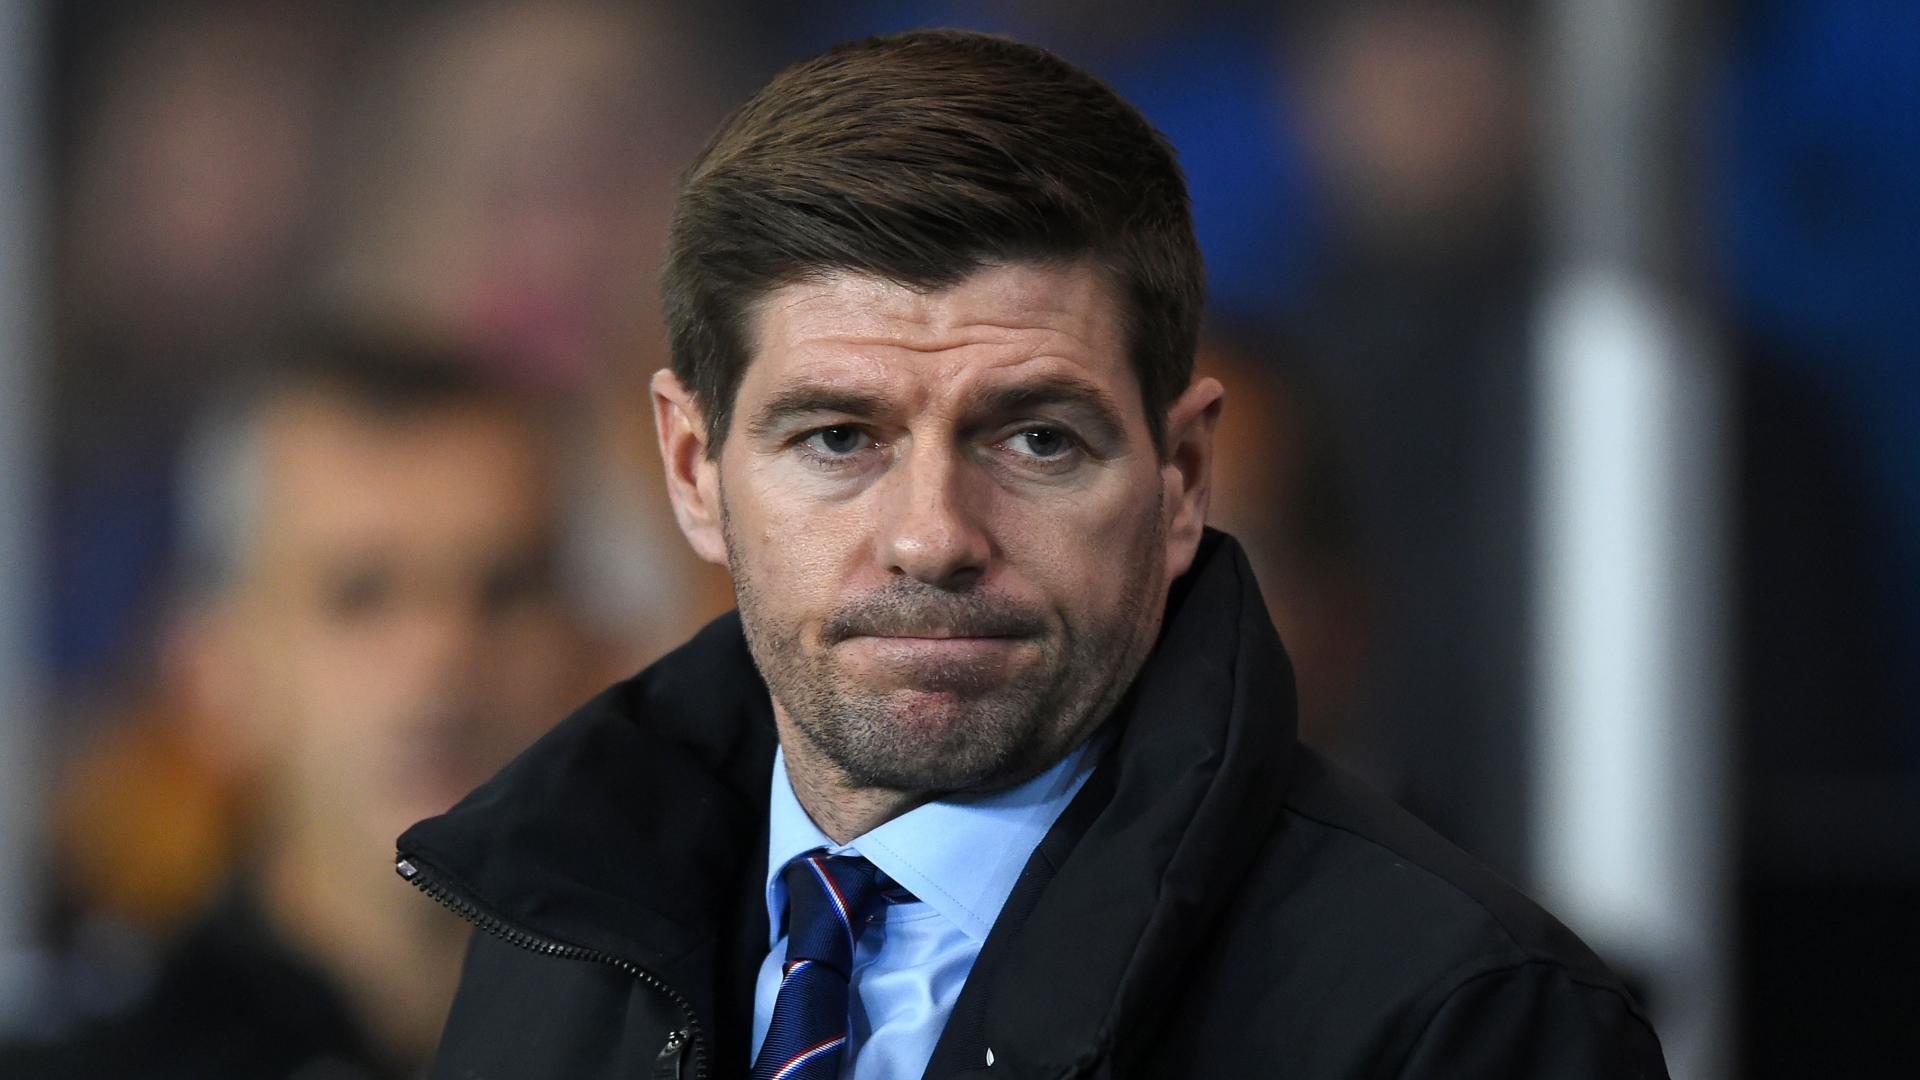 Rangers 1-0 Celtic: Steven Gerrard says fans have 'bragging rights'